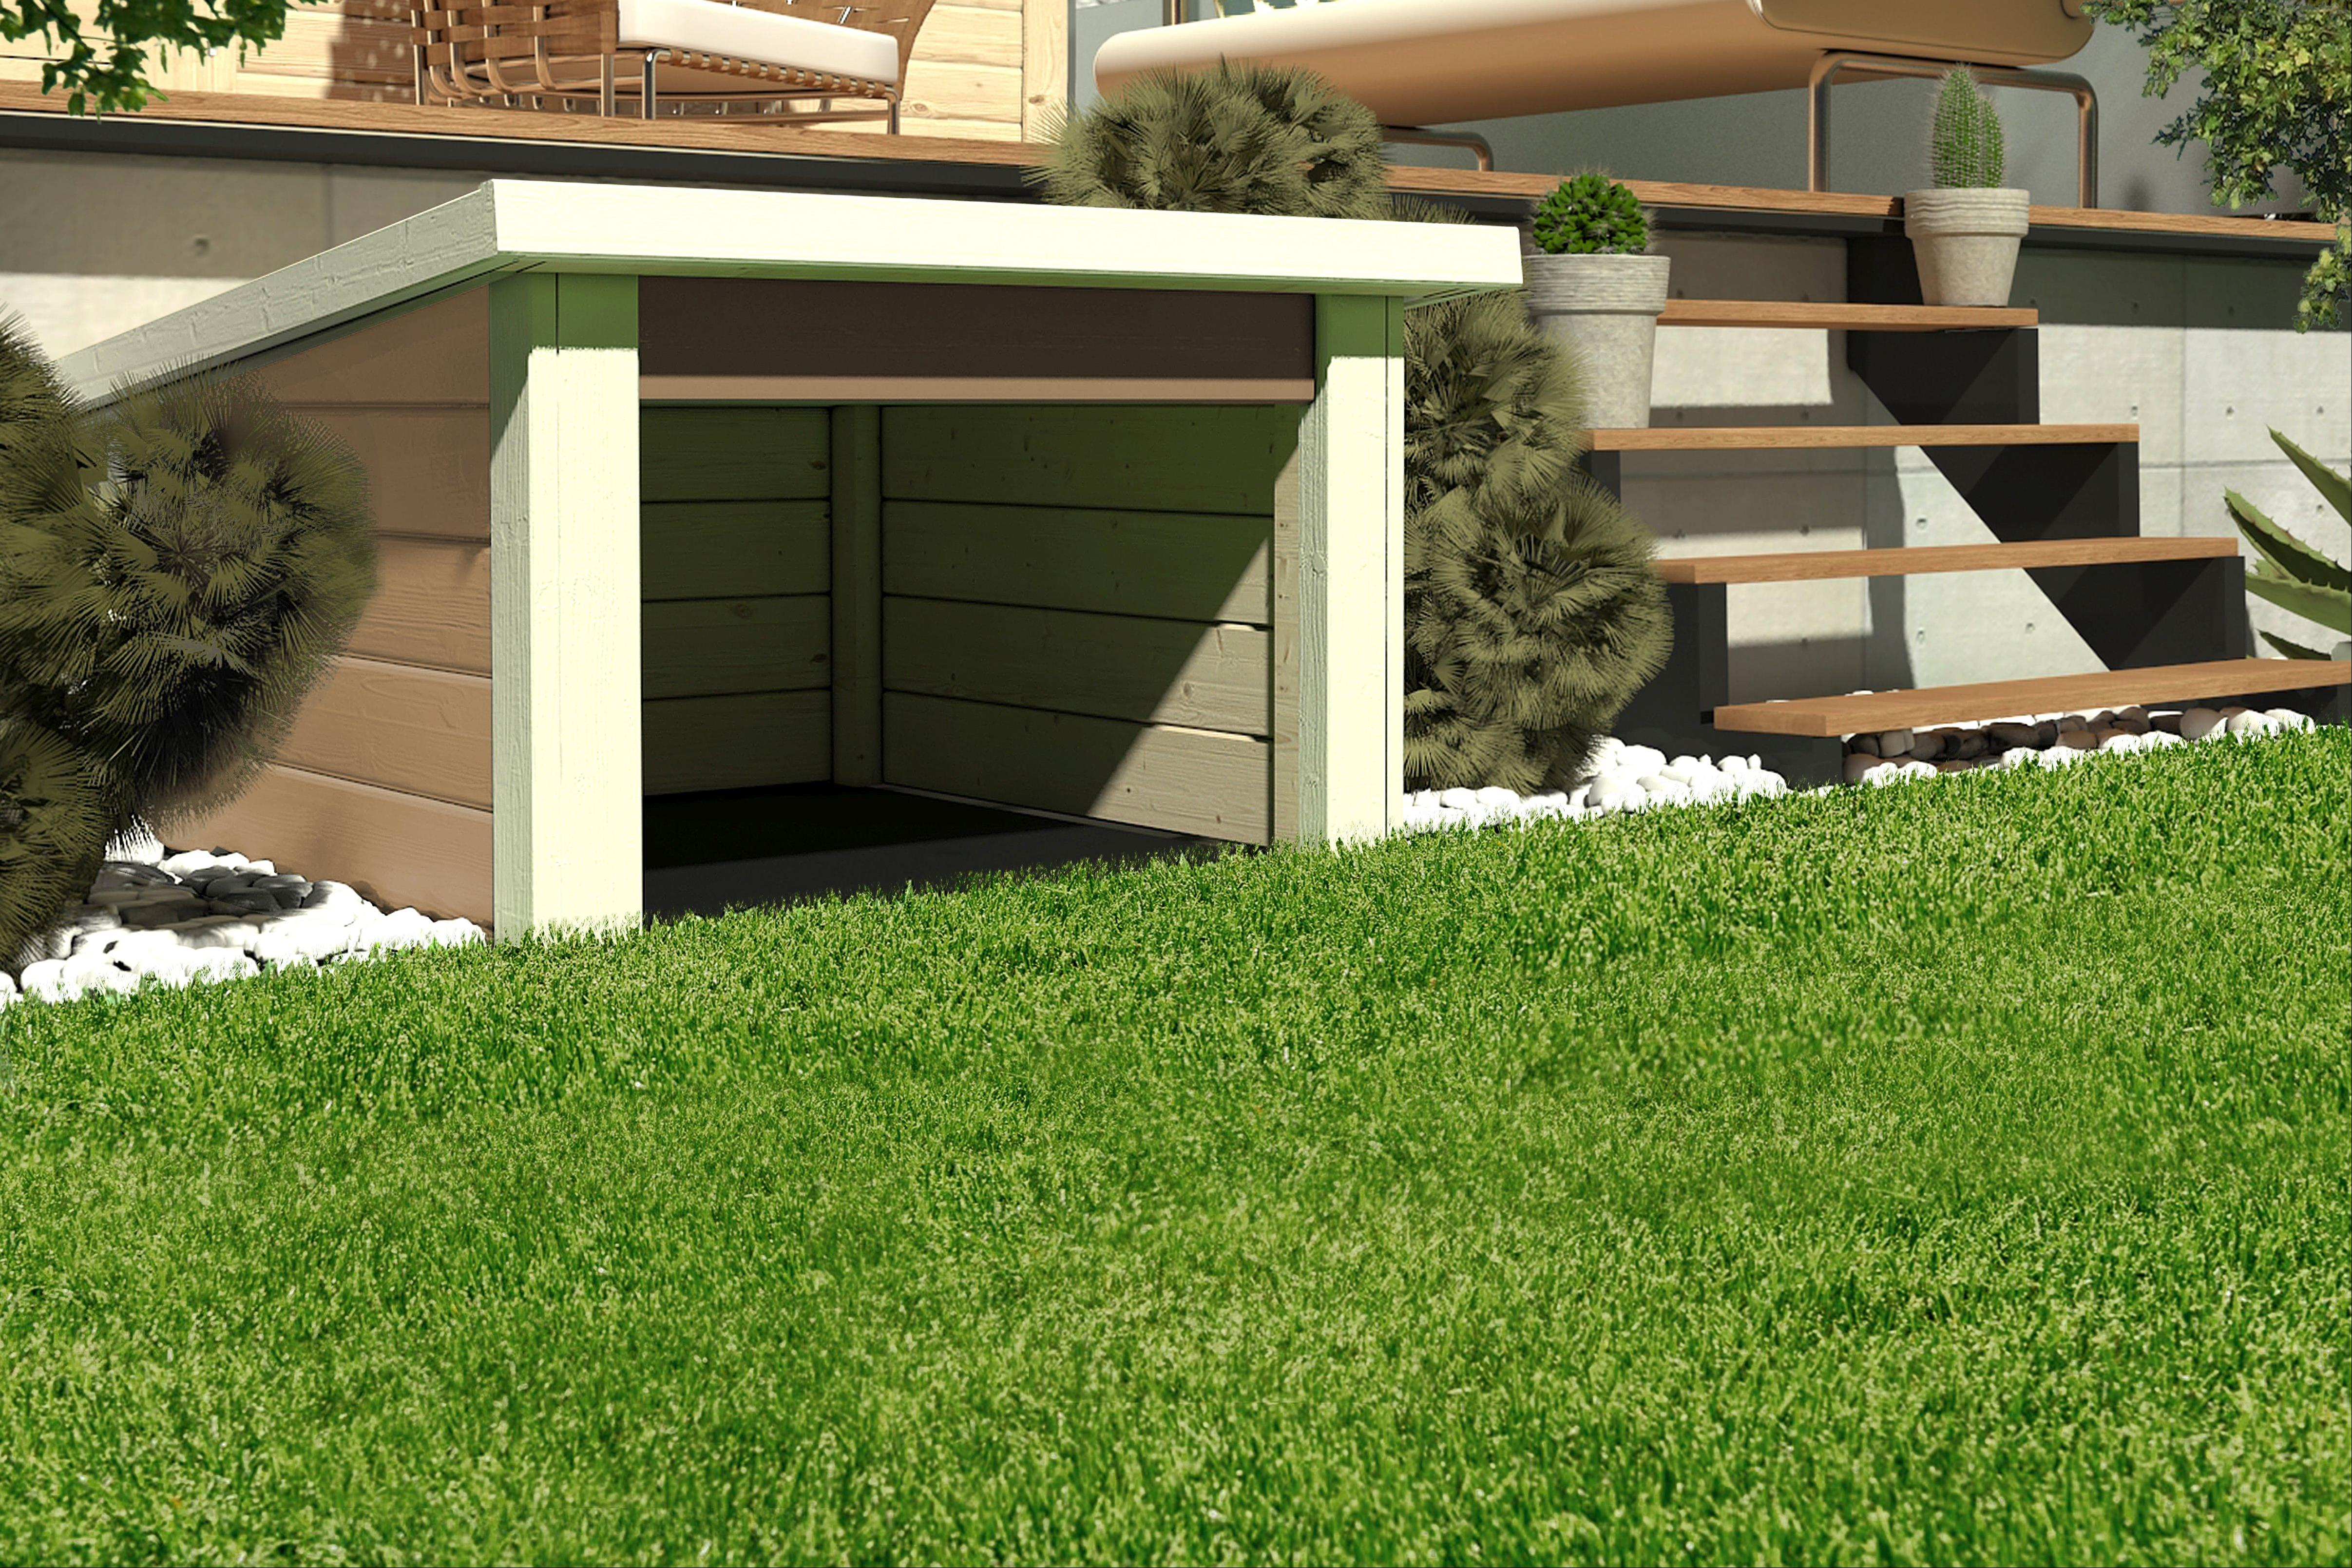 Woodfeeling Mähroboter Haus / Garage 1 sandbeige 73x77x49cm Bild 1